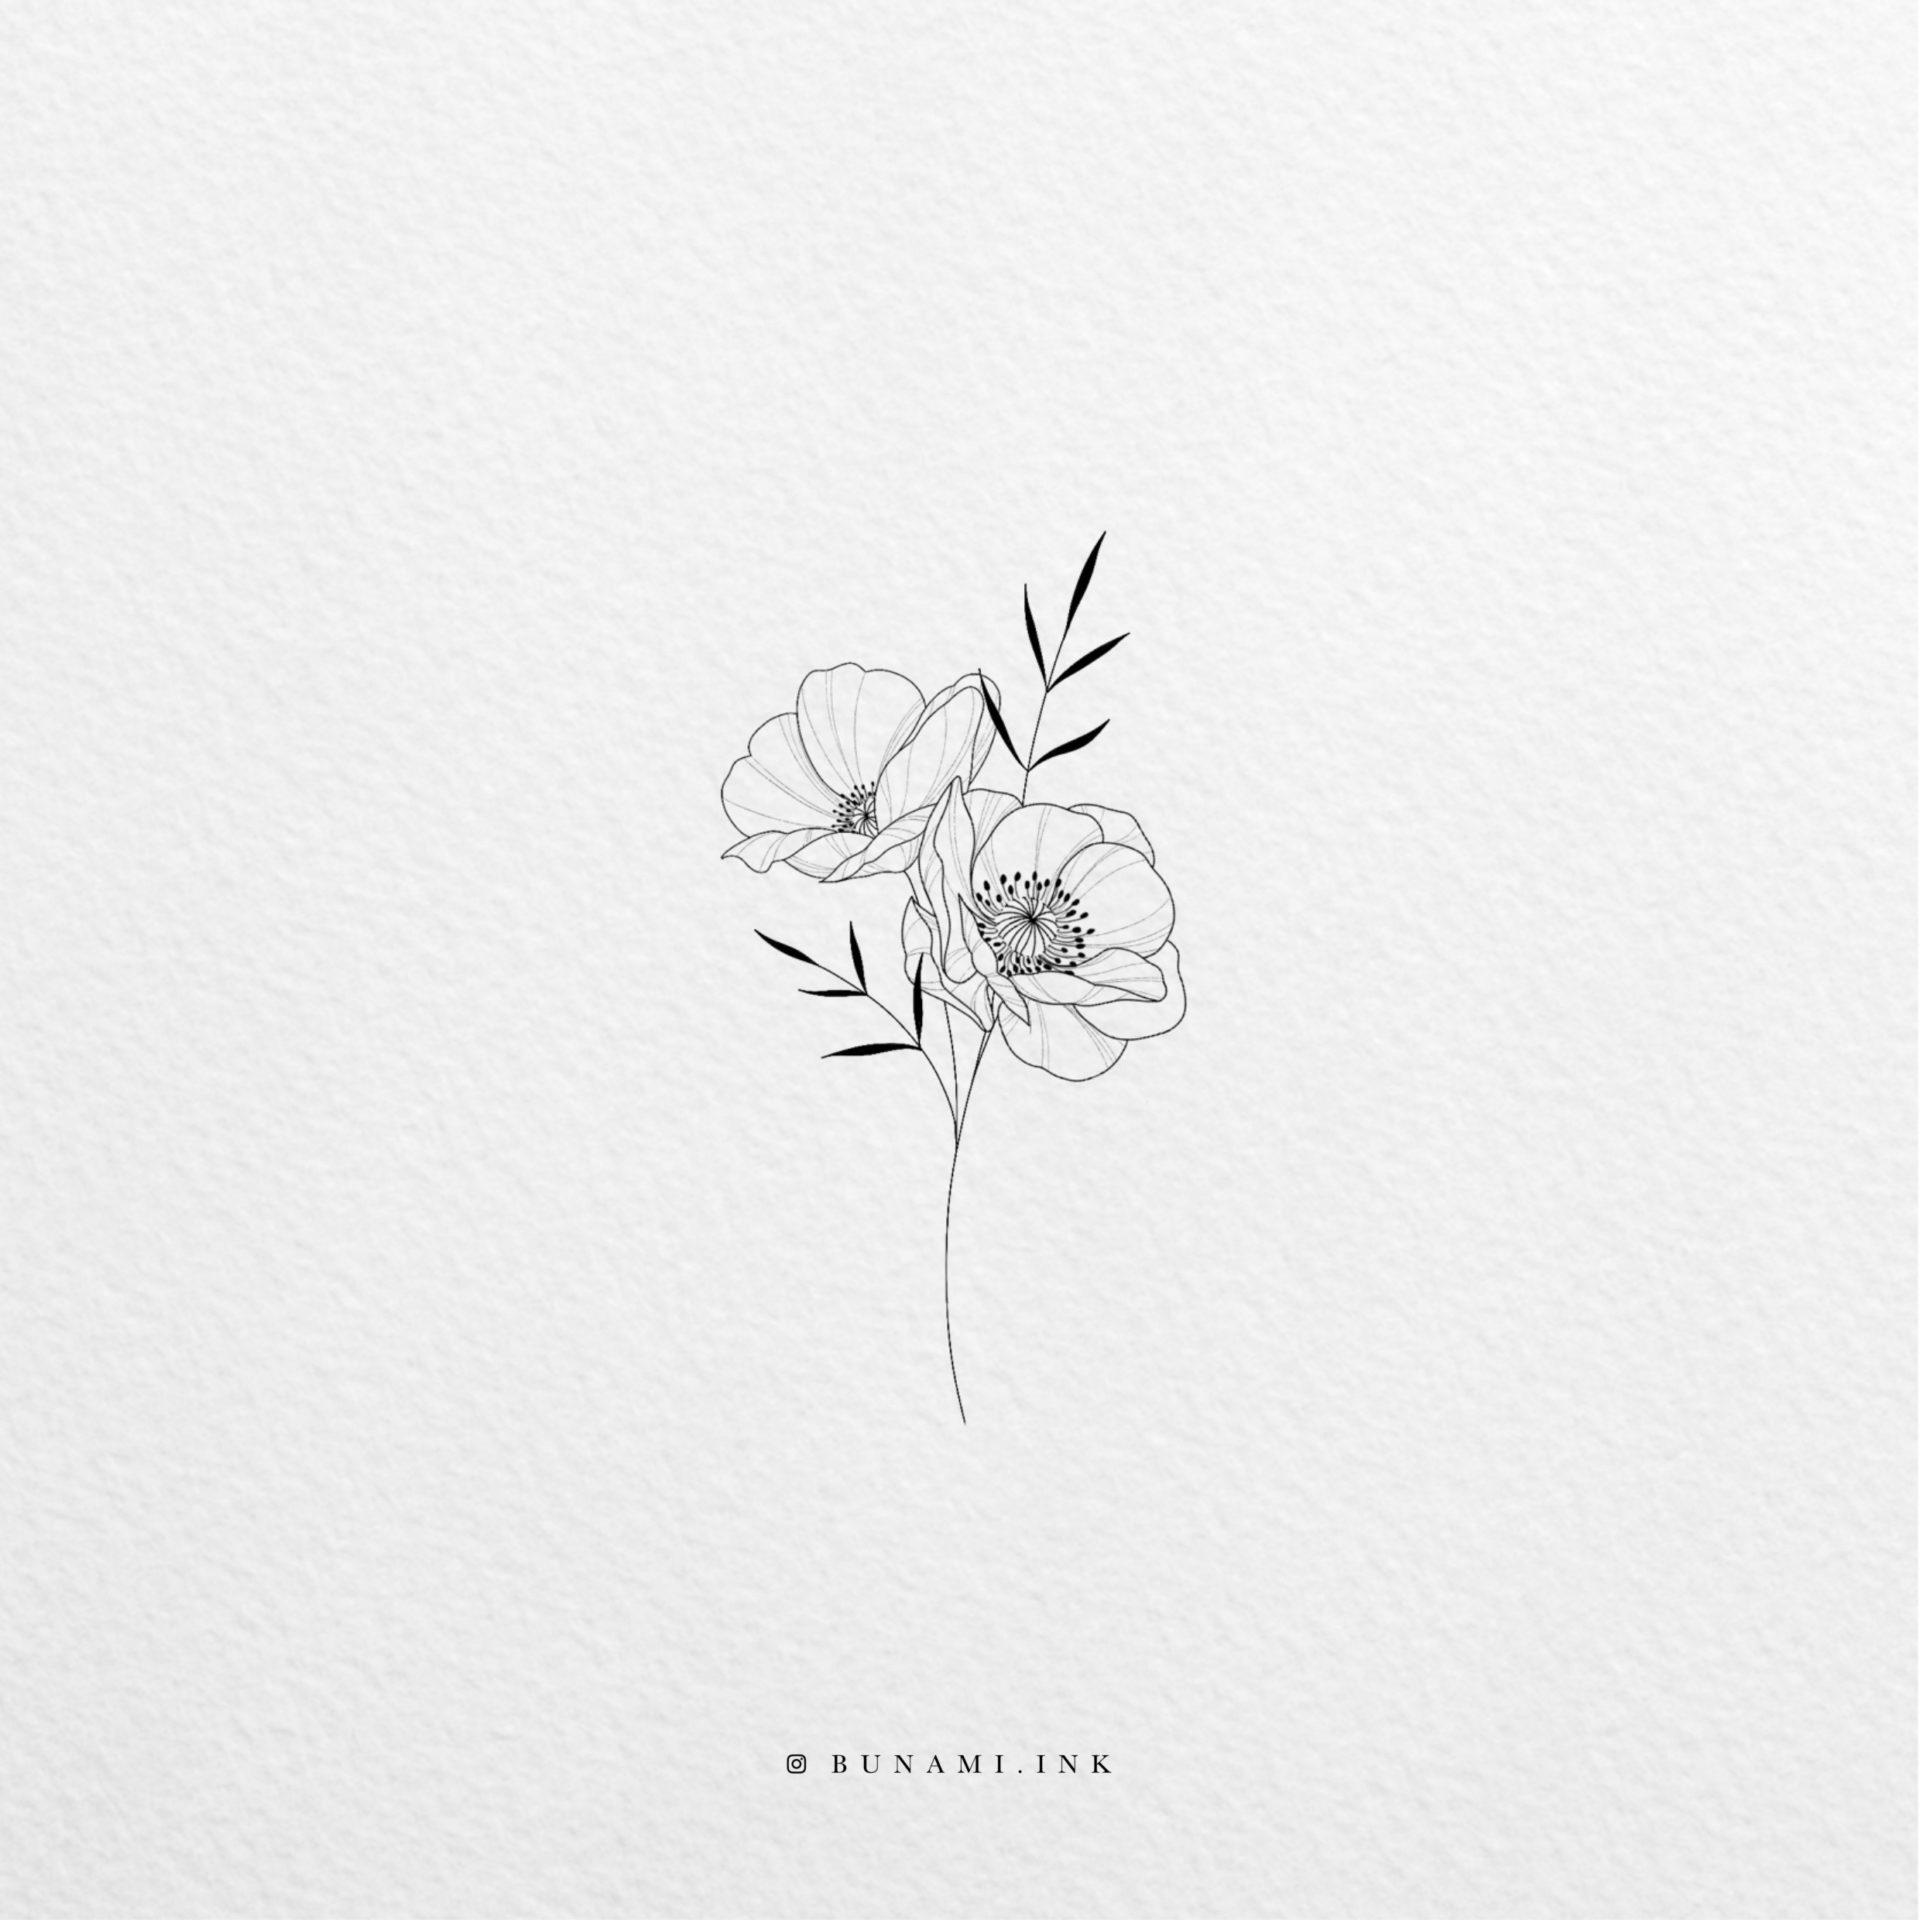 anemone-bouquet_2020-10-10